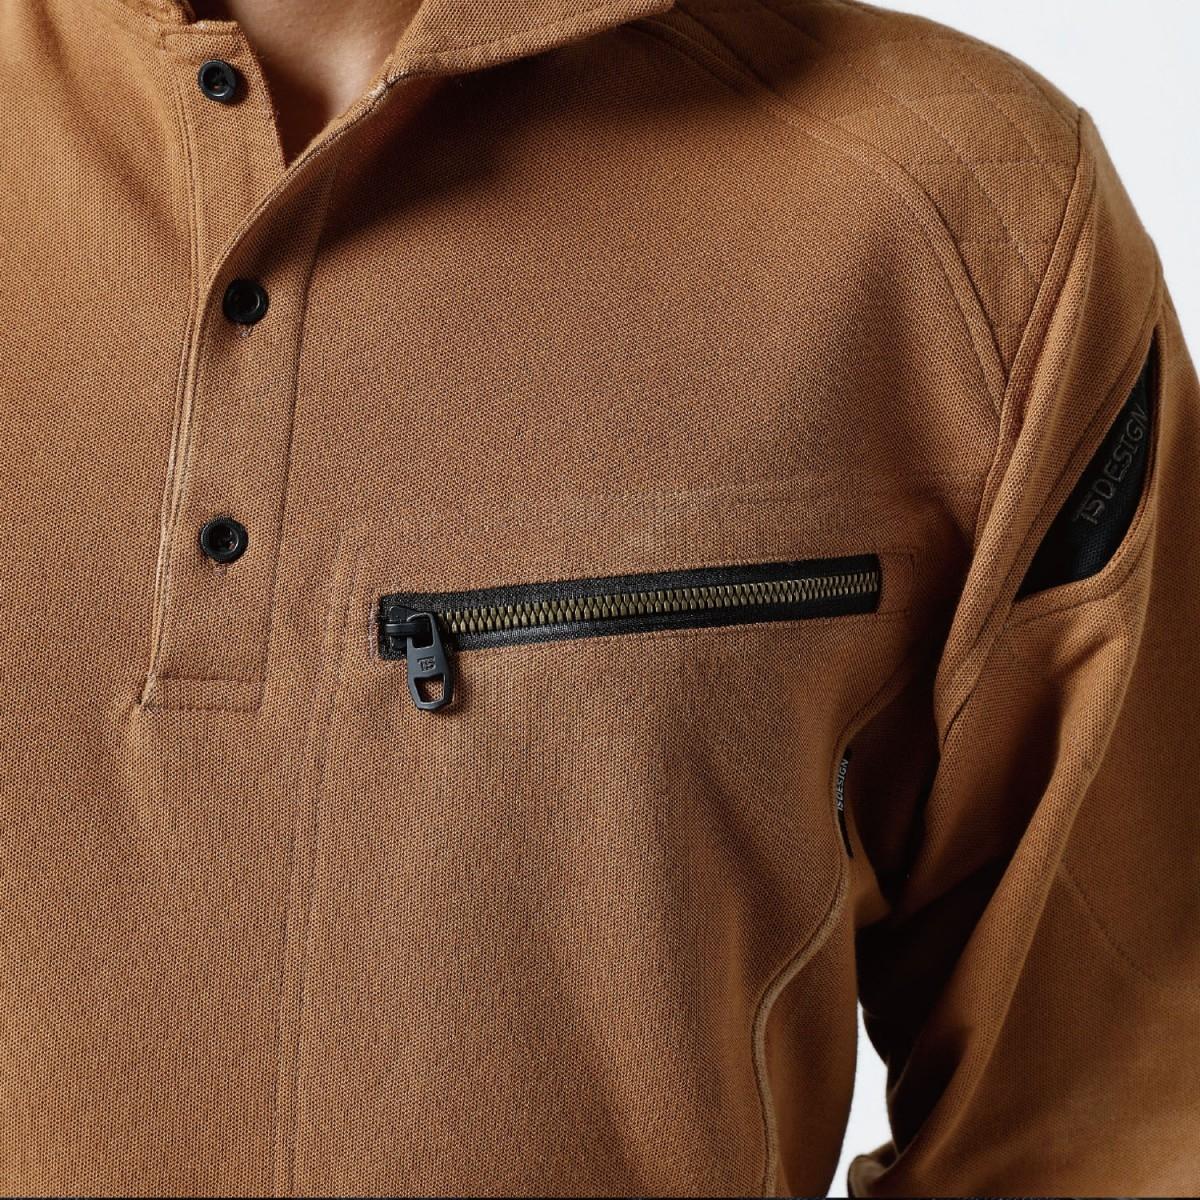 TS DESIGN~TSデザイン~5015 ワークニットロングポロシャツ 左胸大型ポケット。